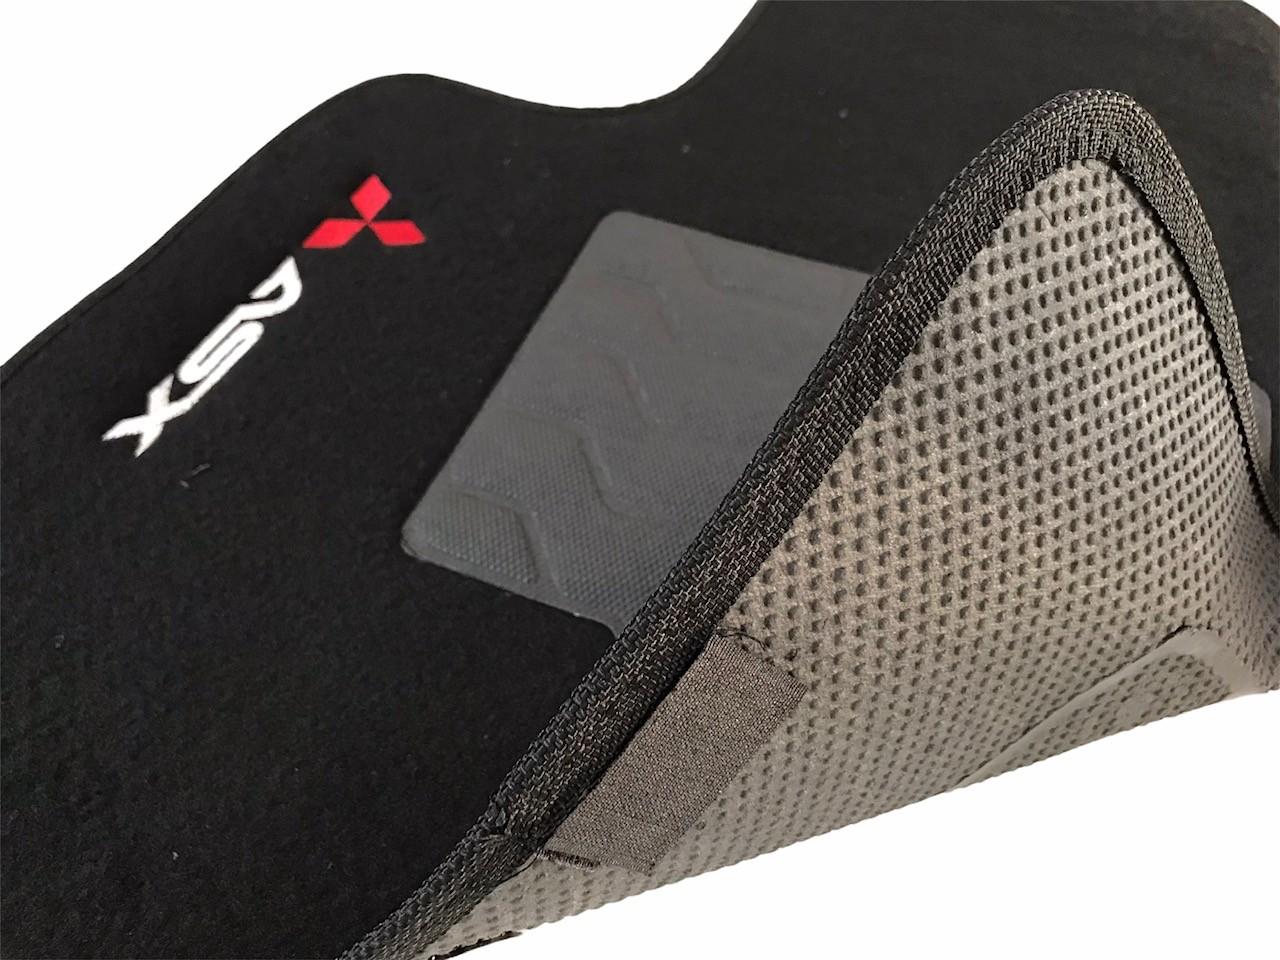 Tapete Carpete Mitsubishi Preto 5 Pecas